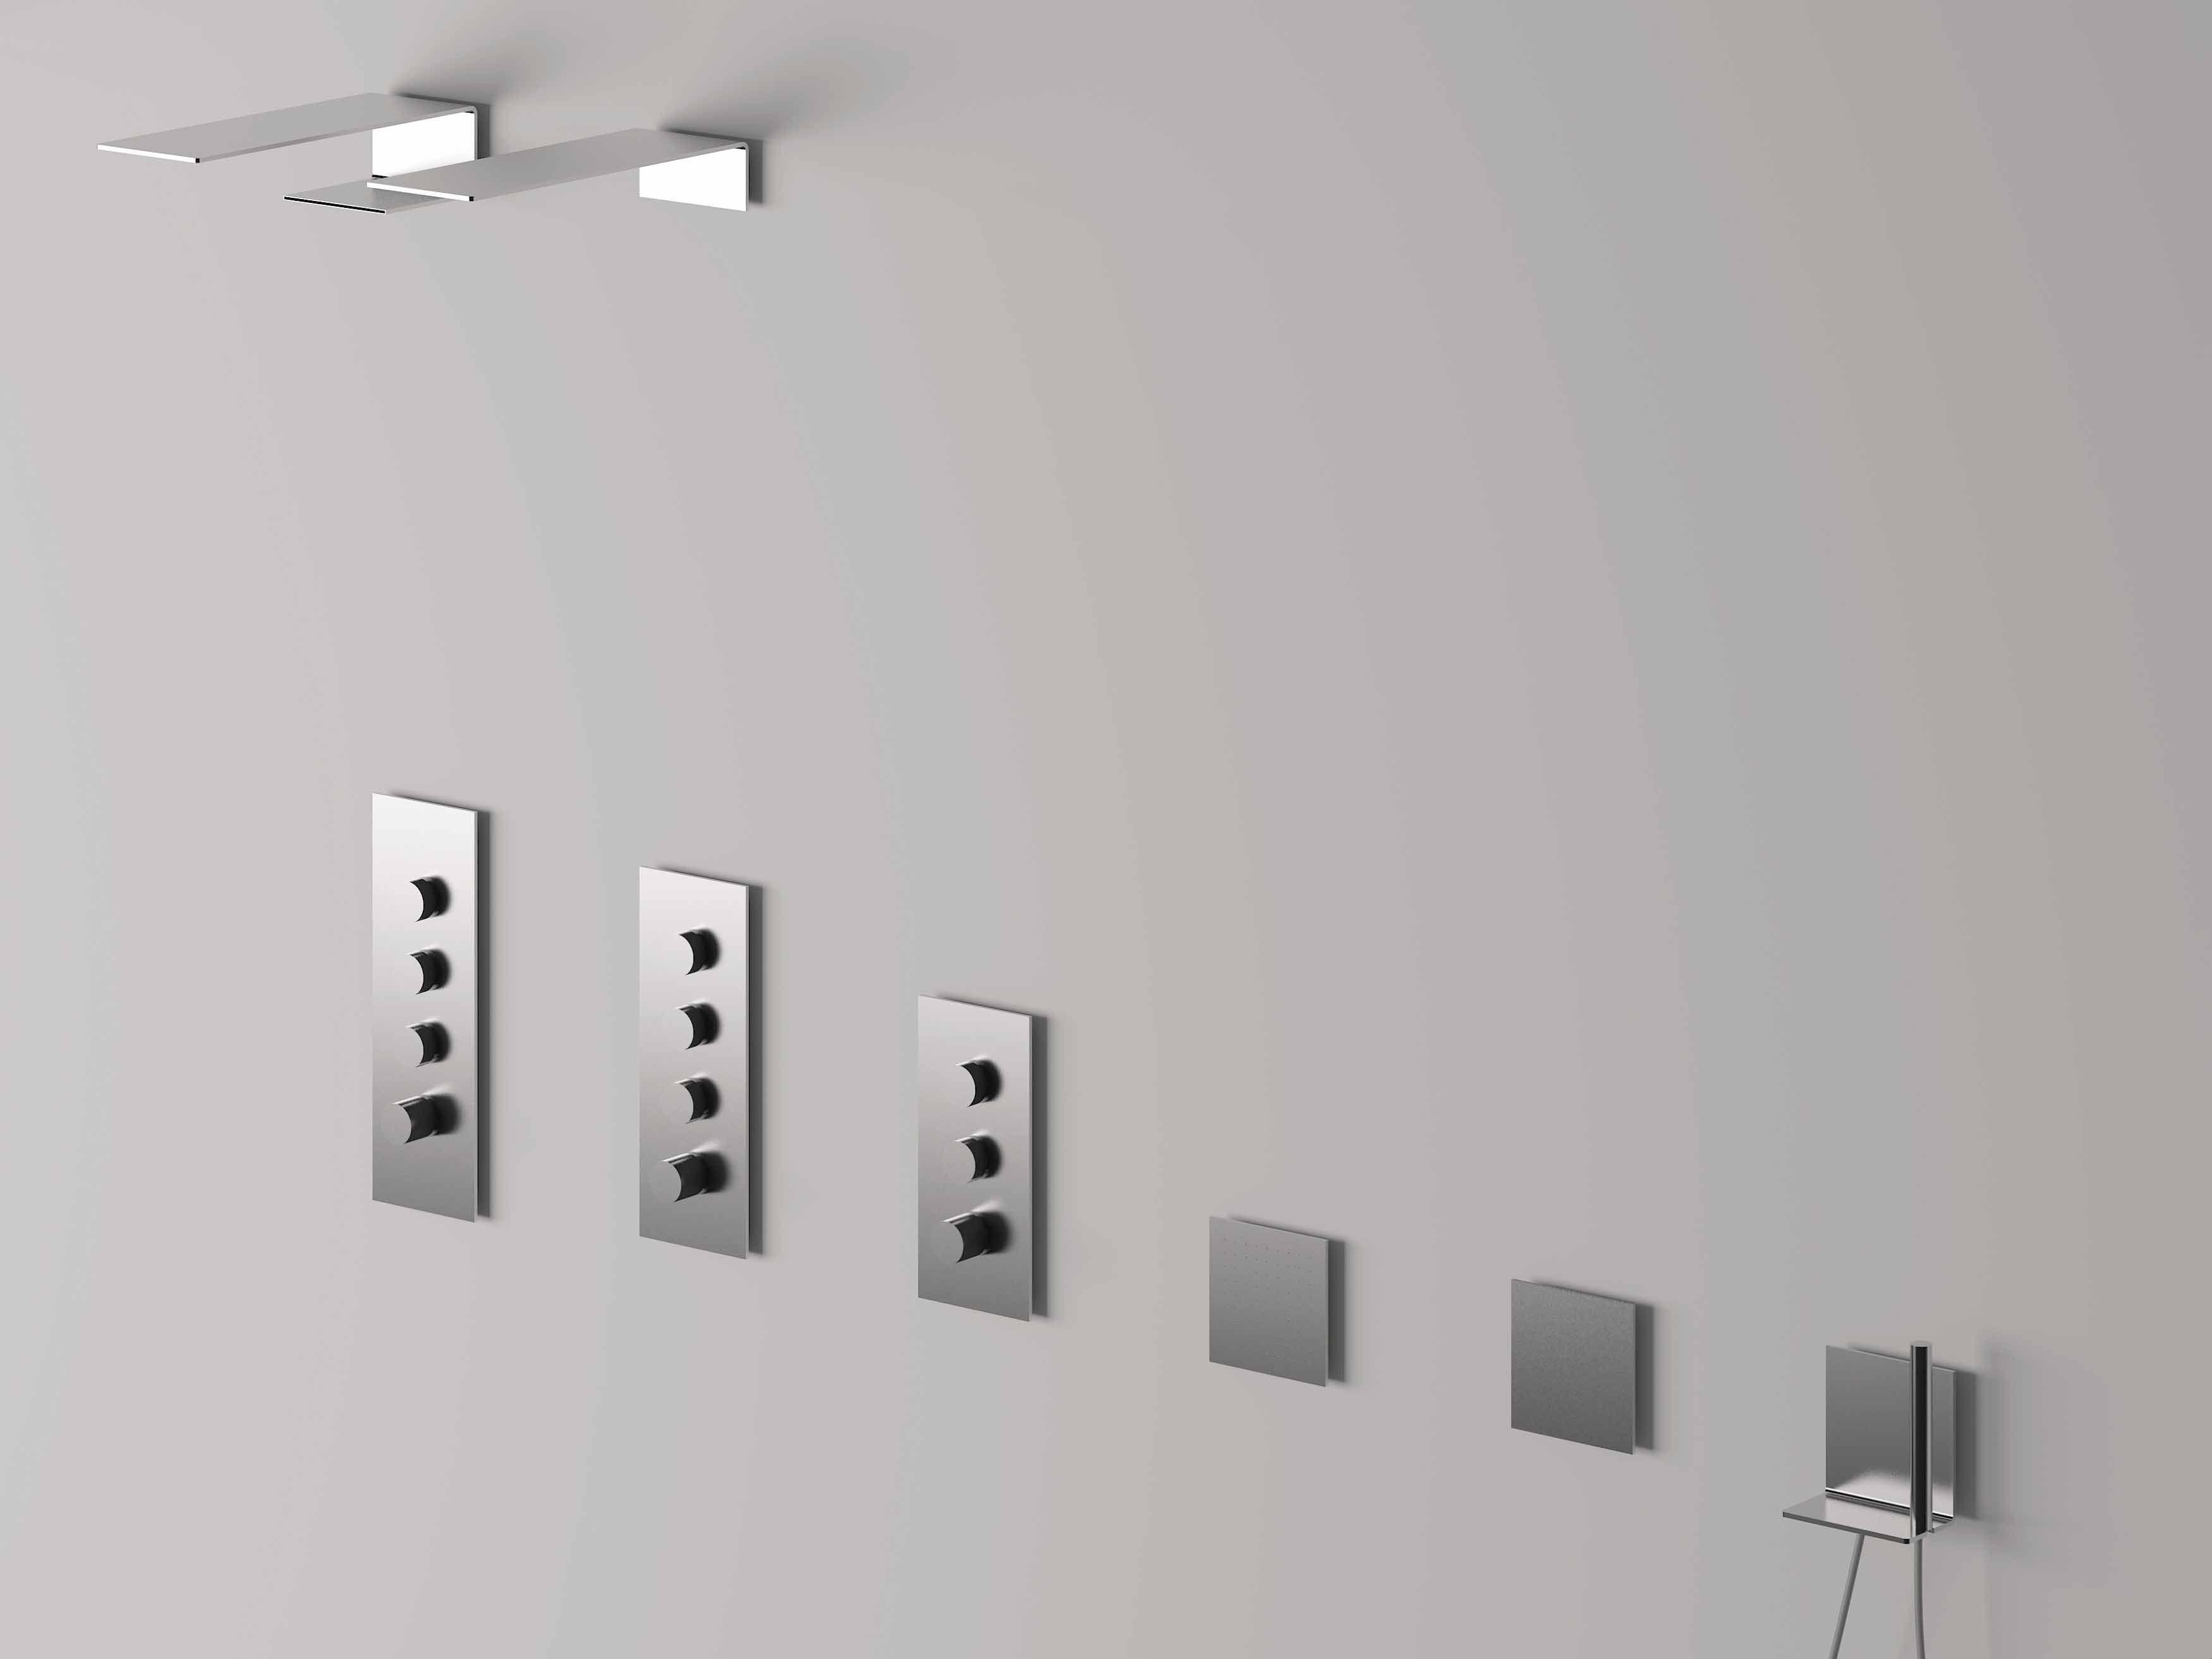 5mm t te de douche mural by rubinetterie 3m design oco studio - Tete de douche pluie ...